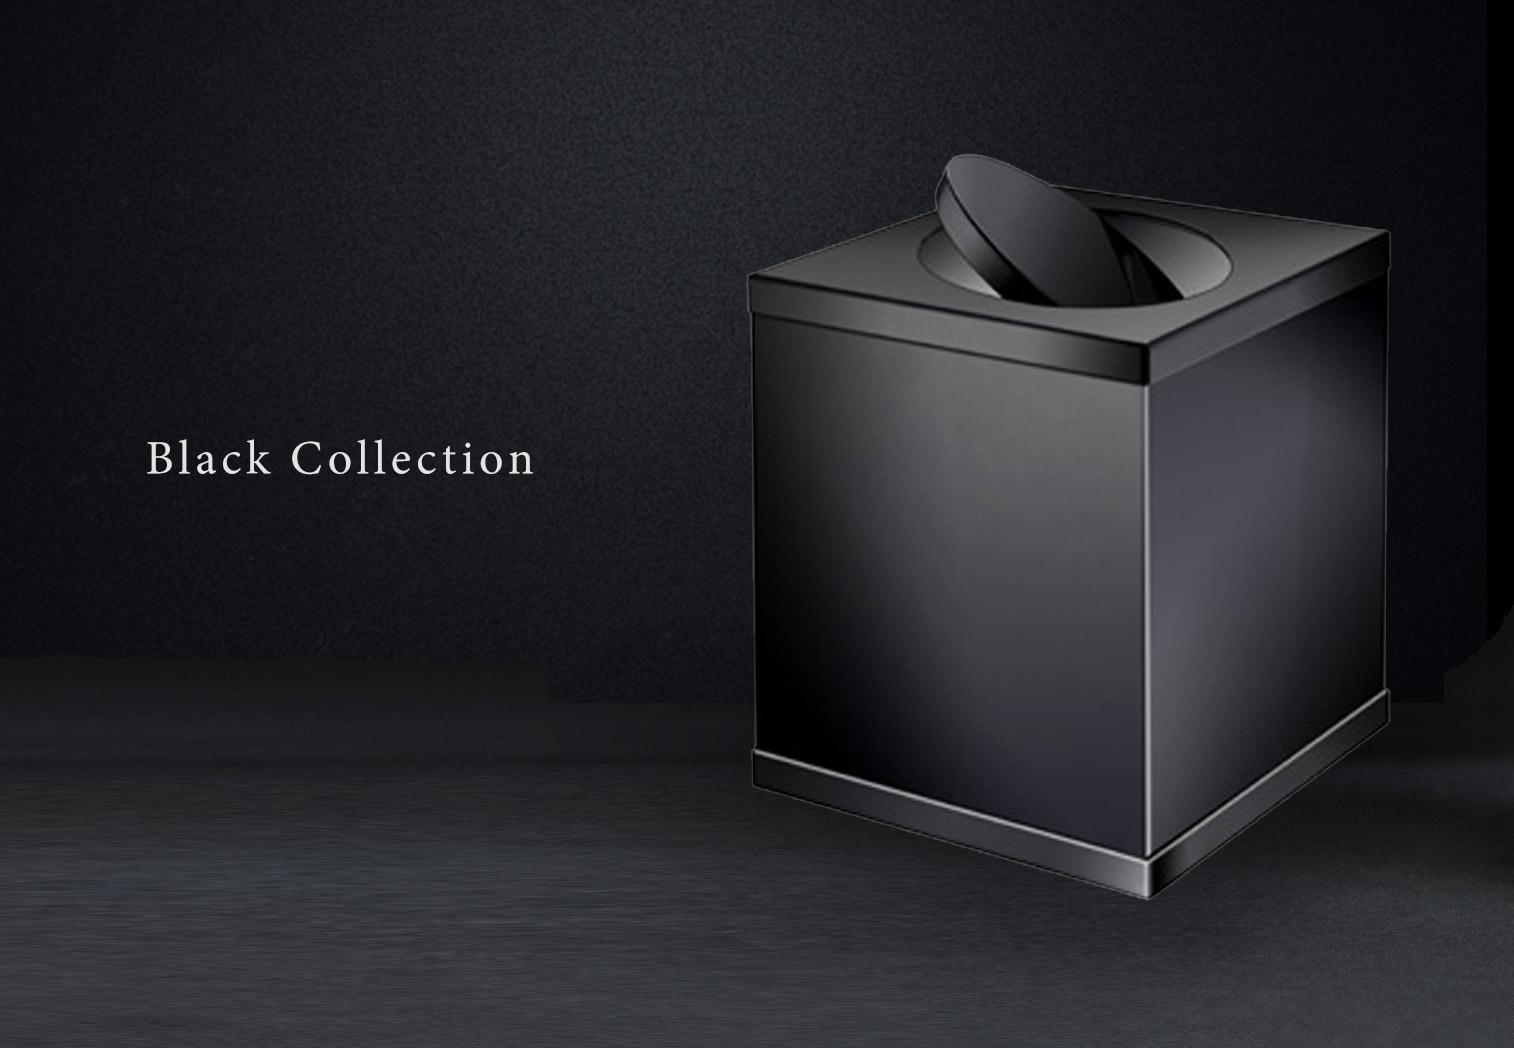 black-collection.jpg